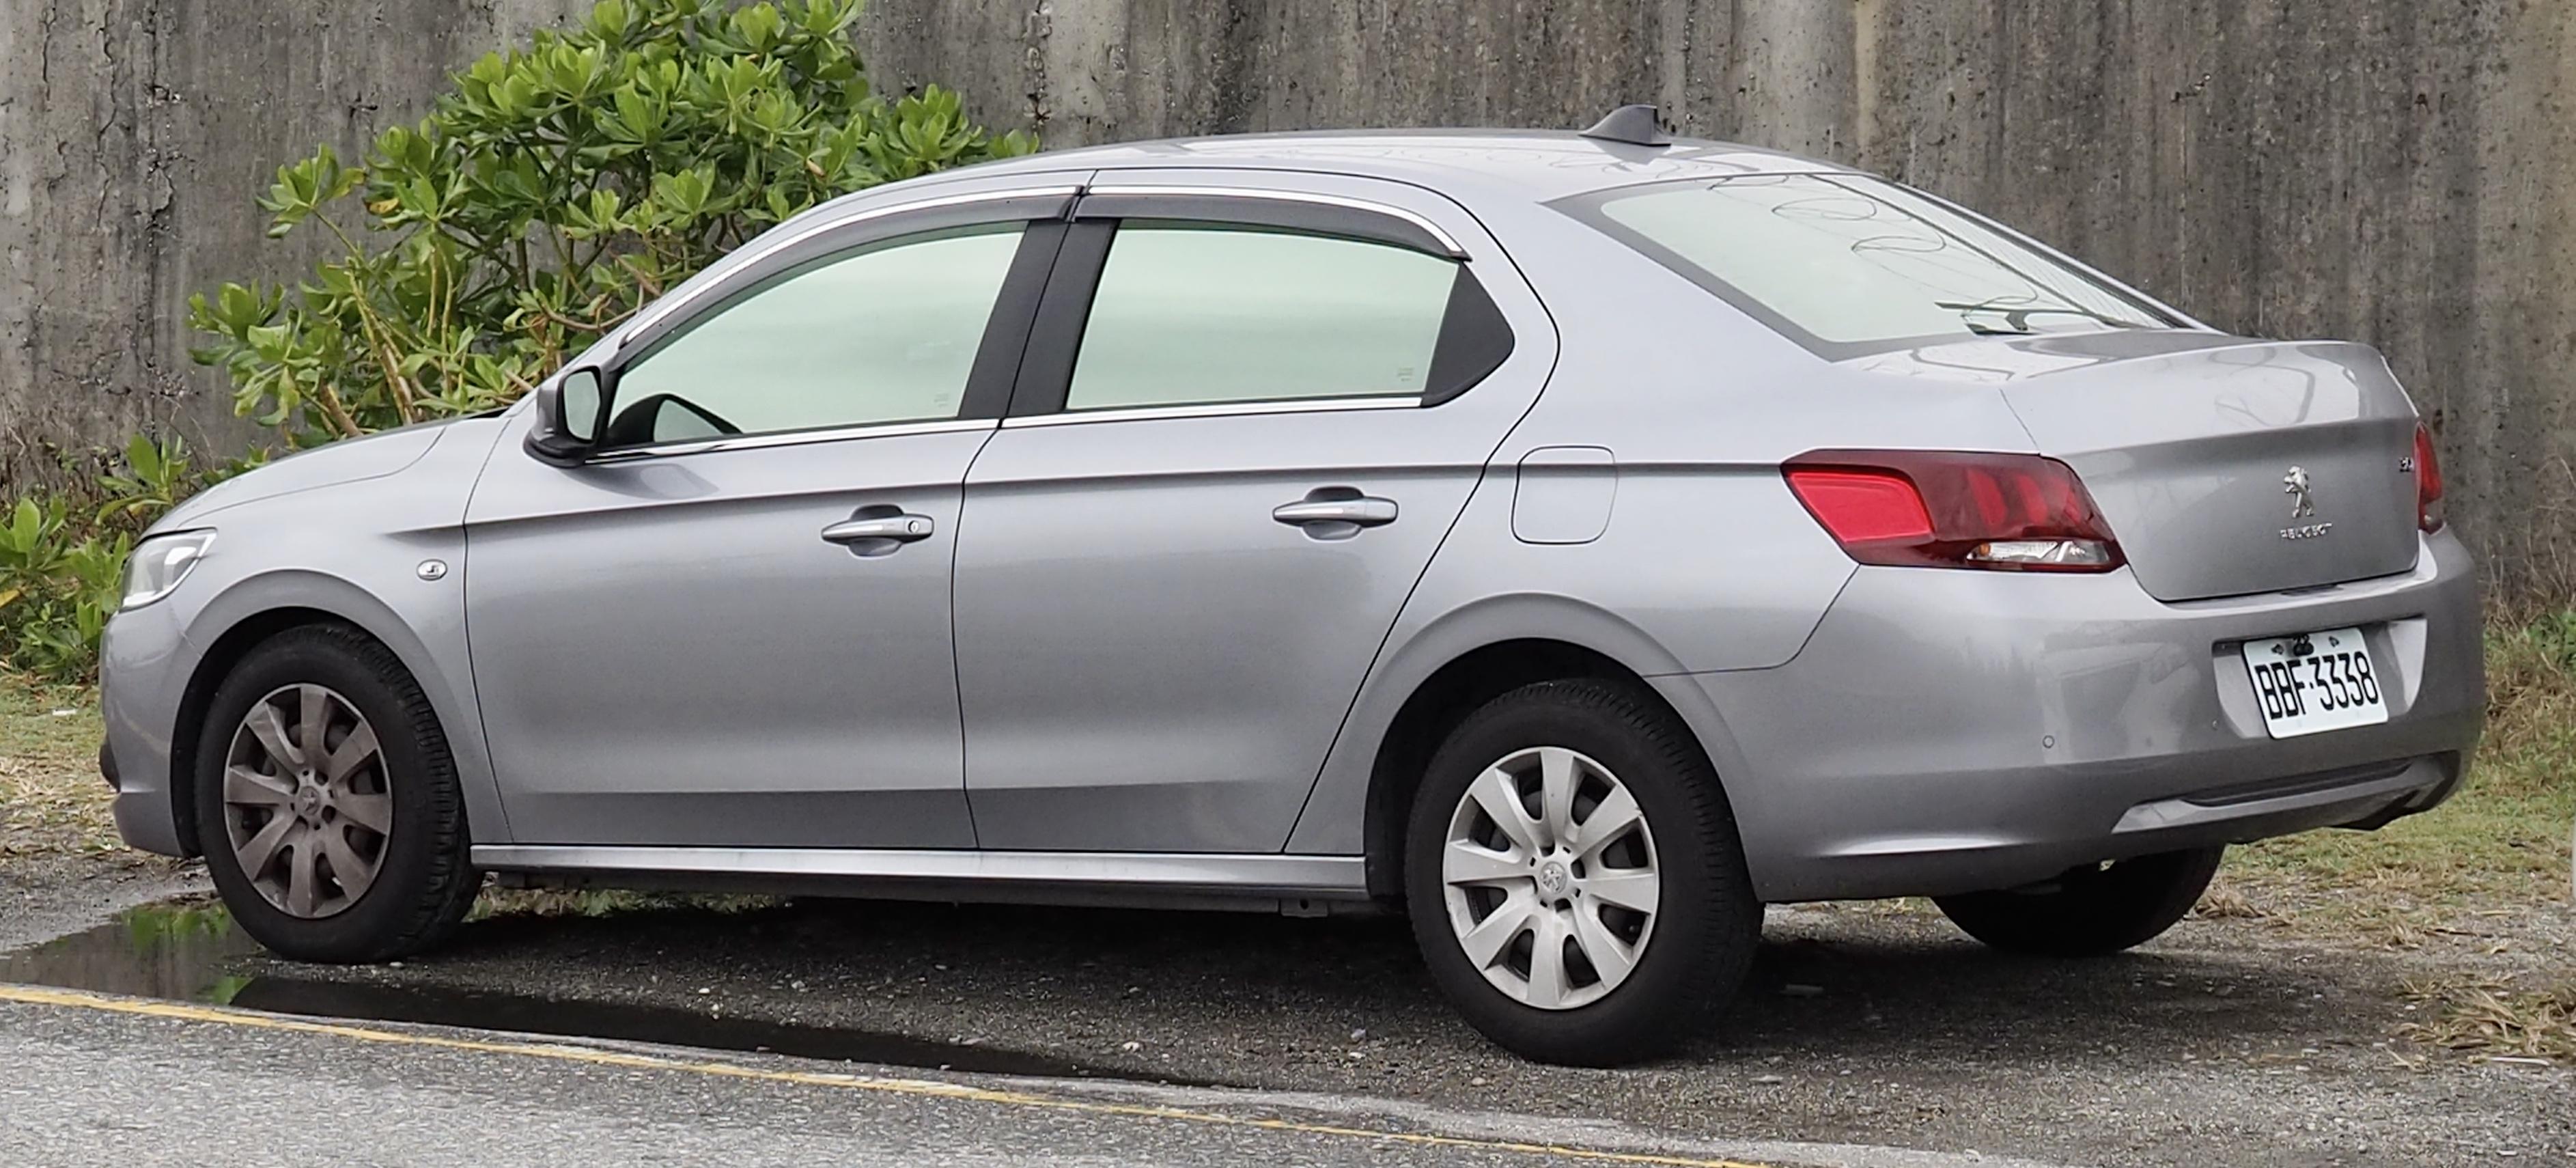 File 2017 Peugeot 301 Facelift Rear Jpg Wikimedia Commons